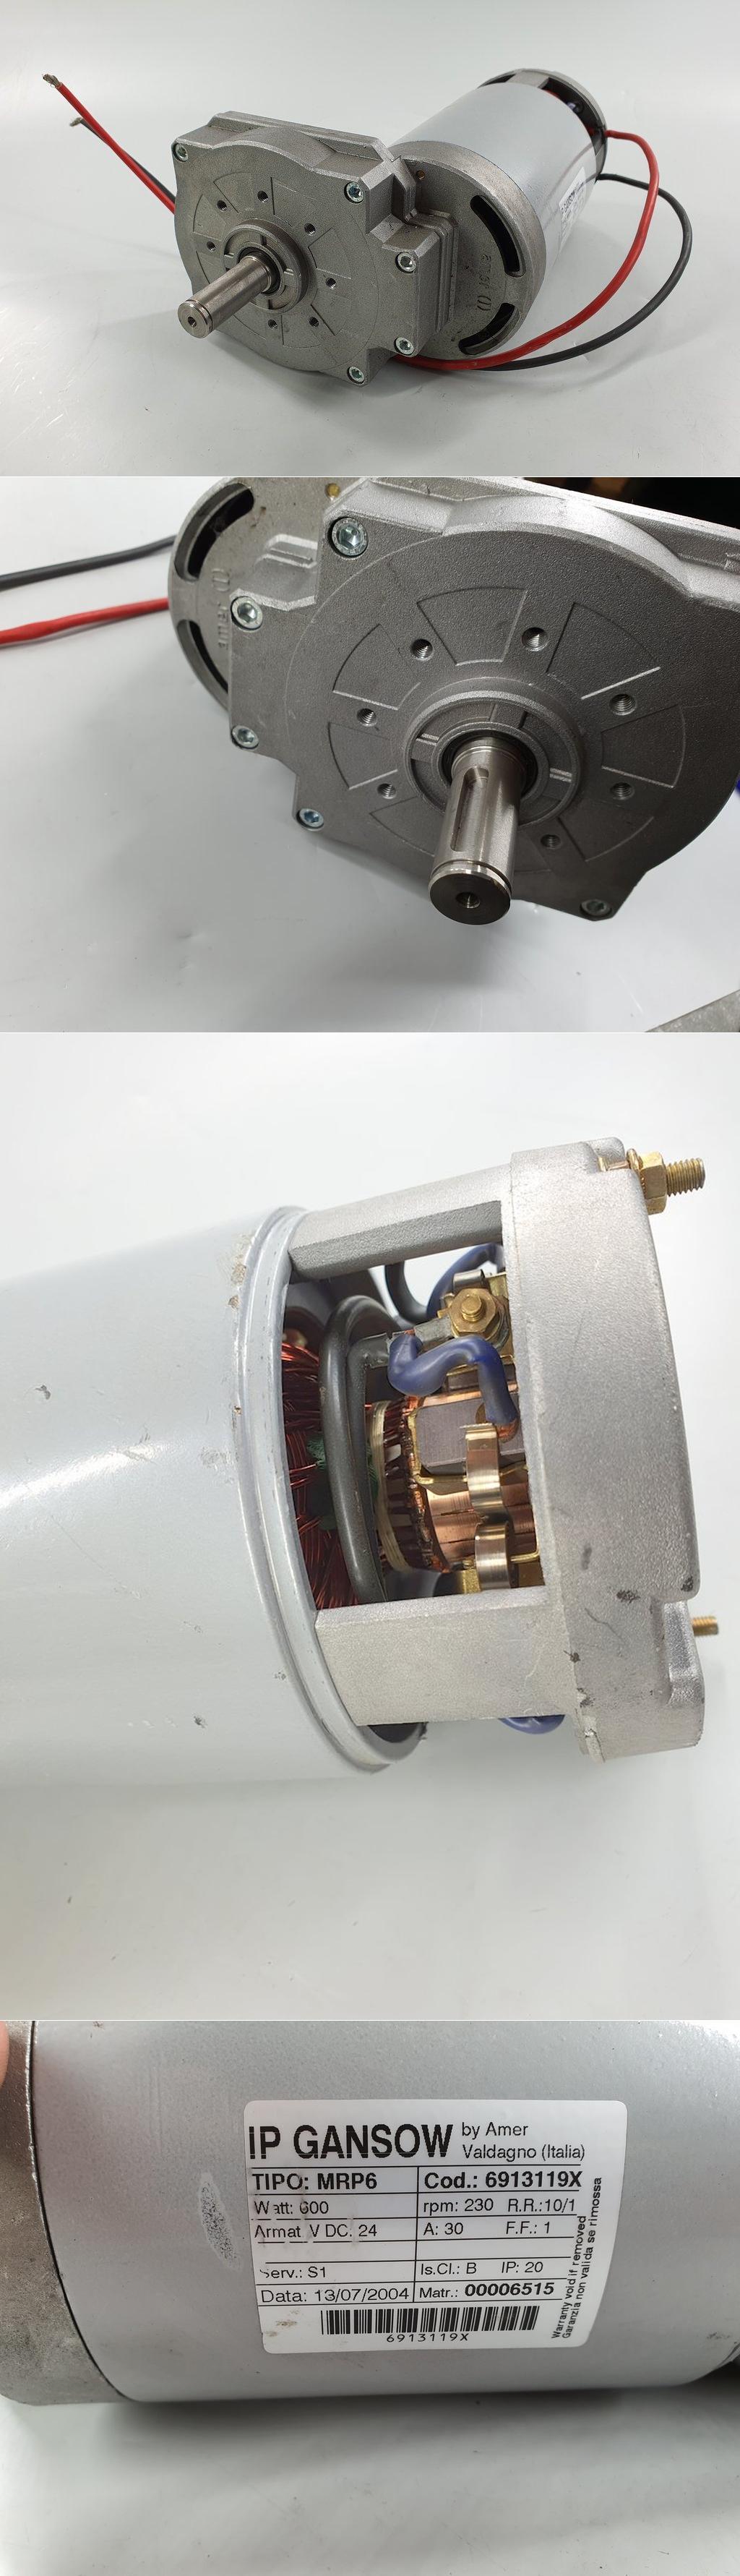 PQ174 Gleichstrommoter Getriebe Gansow MRP6 24V DC 600W 230U min